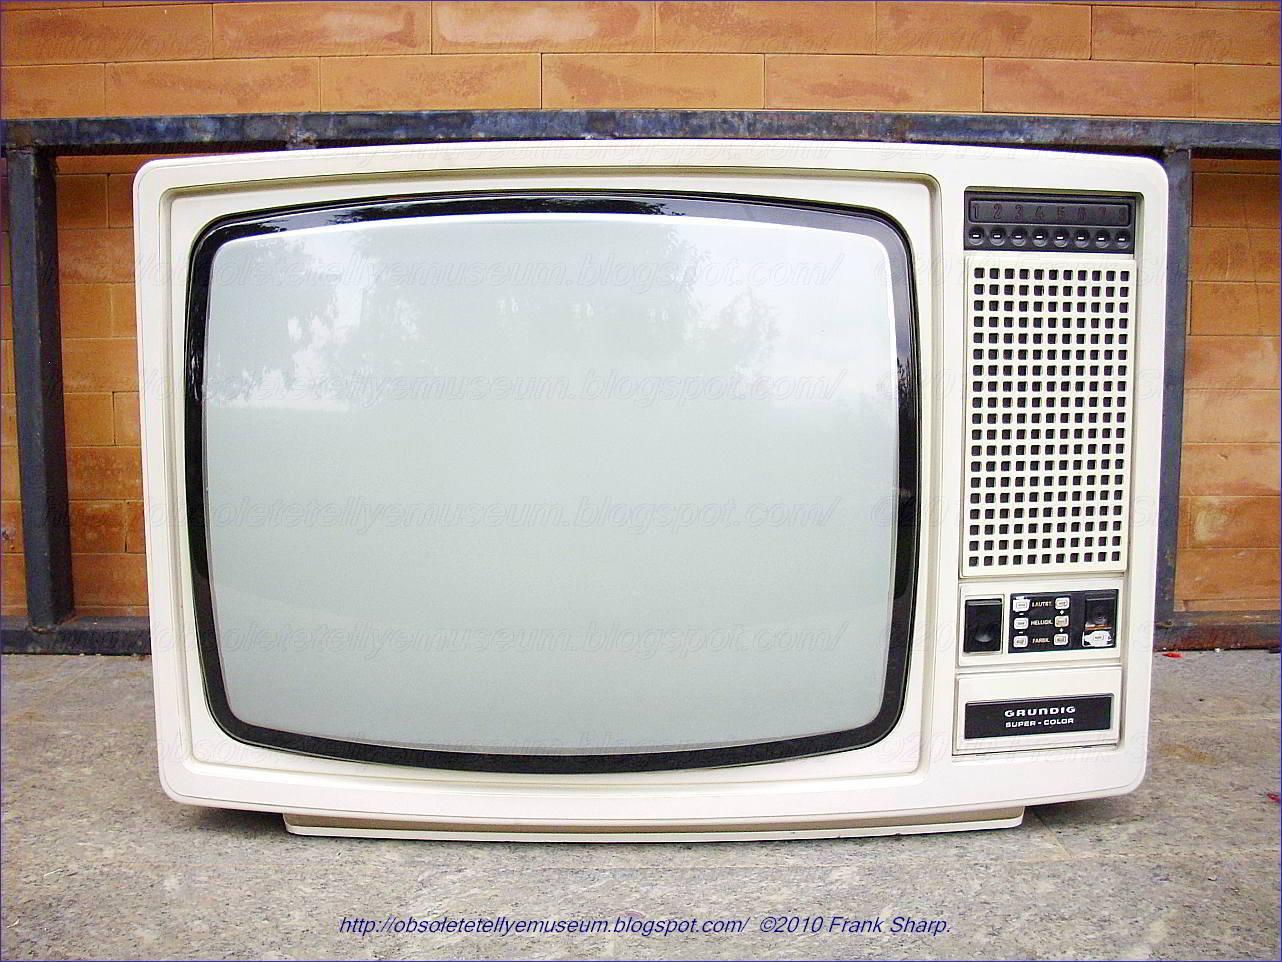 Obsolete Technology Tellye !: GRUNDIG SUPER COLOR 4600 YEAR 1977.